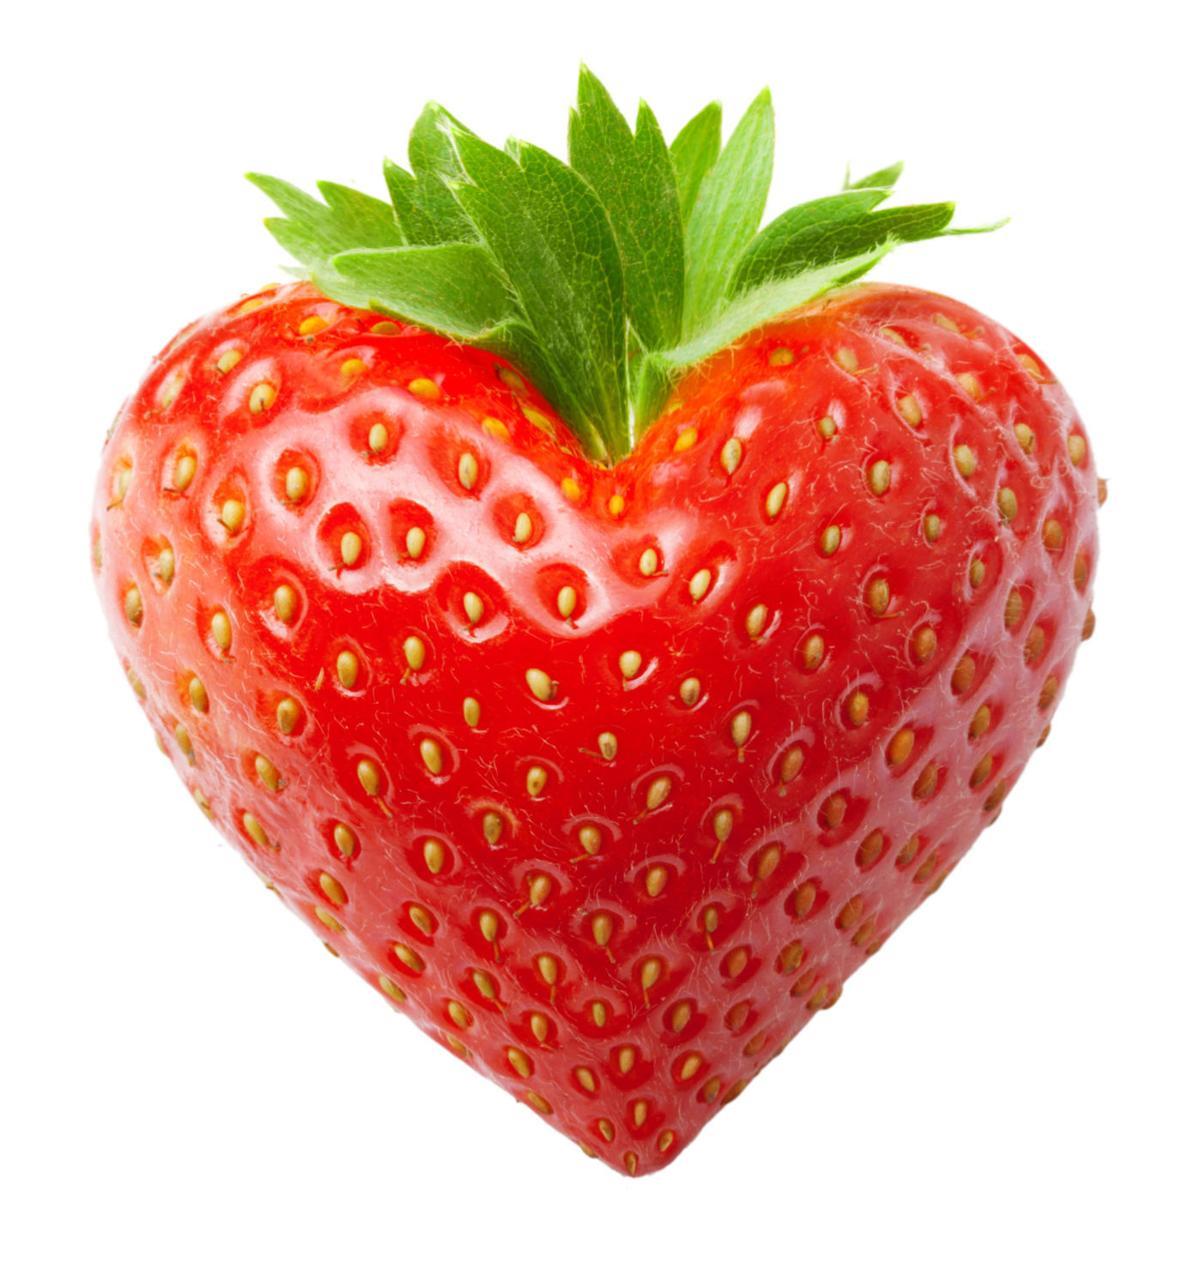 strawberry-heart-NEW.jpg